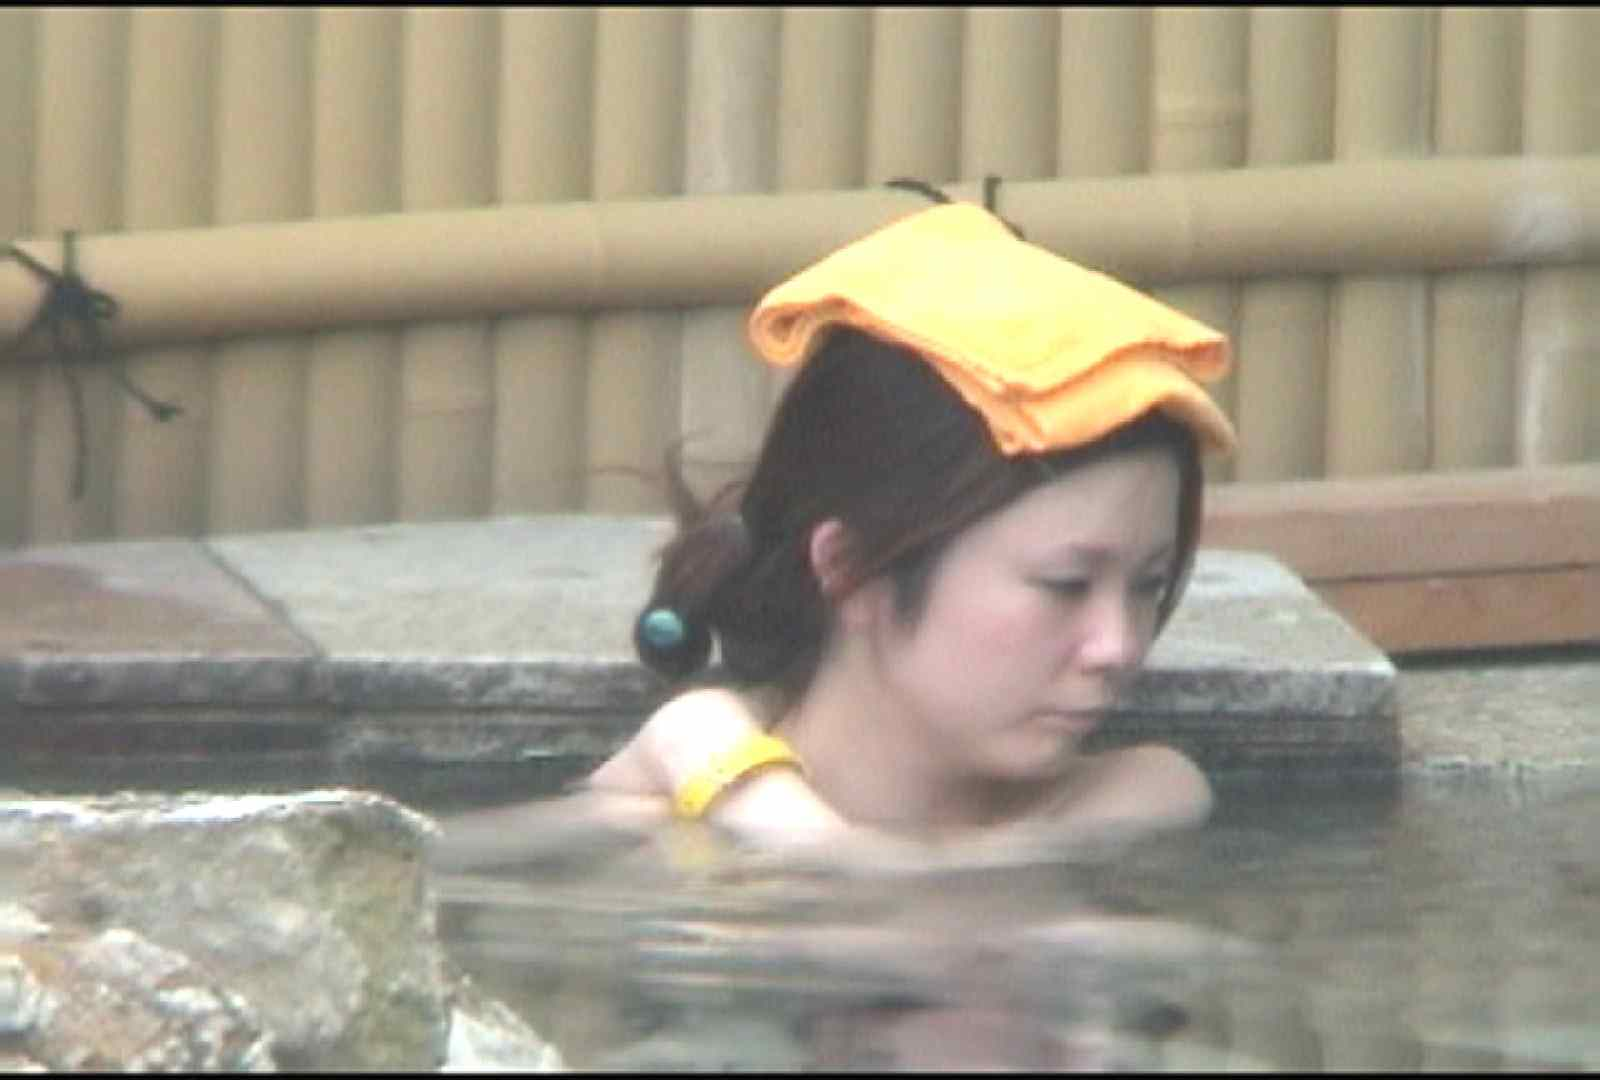 Aquaな露天風呂Vol.177 盗撮師作品  102pic 9